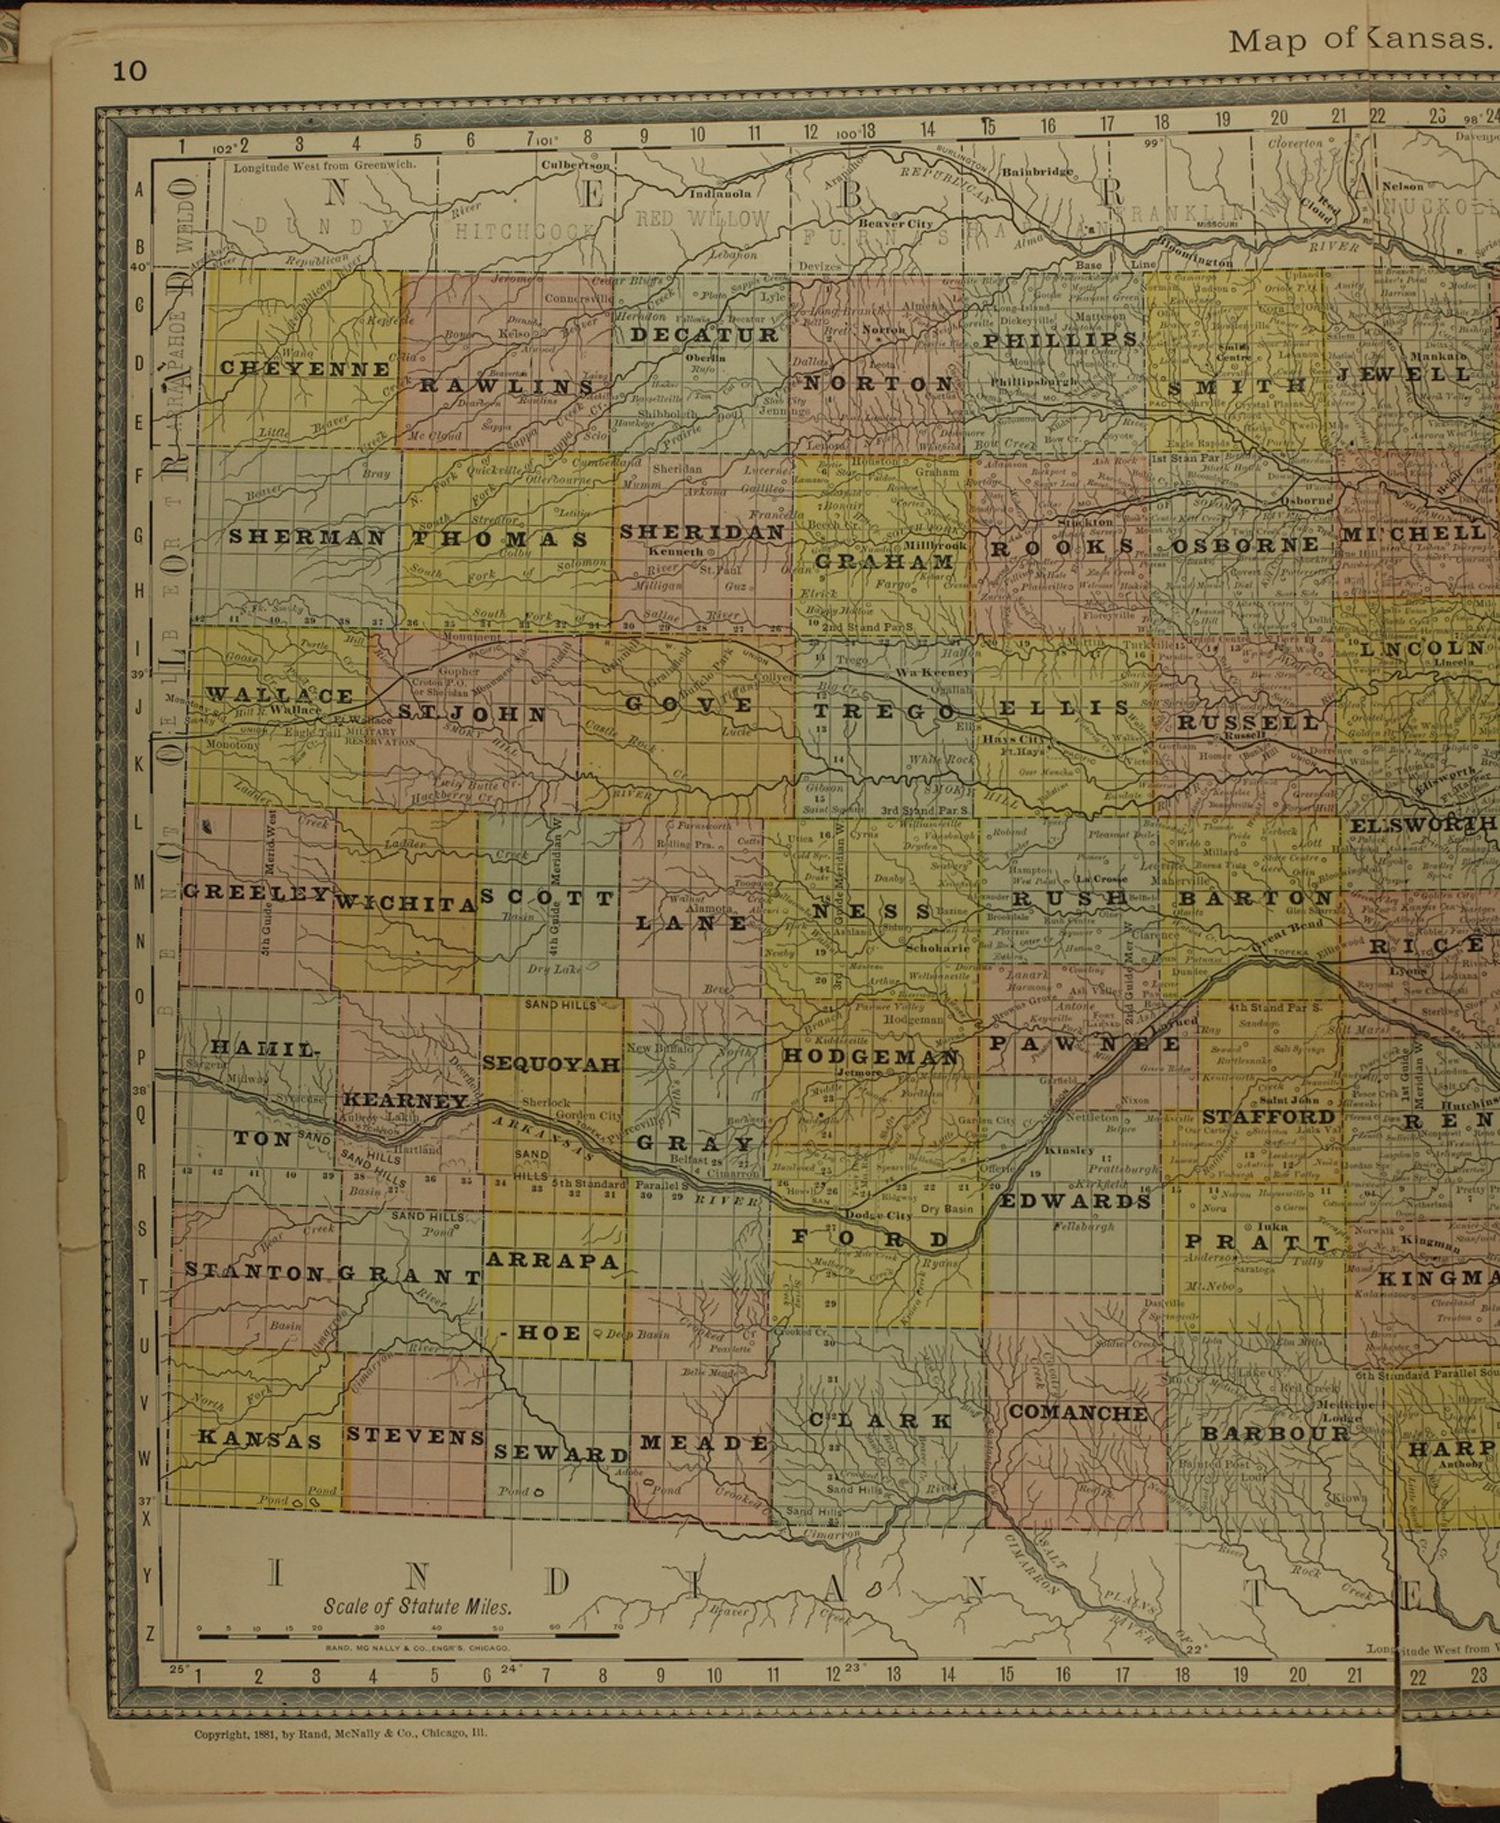 Historical plat book of Washington County, Kansas - 10